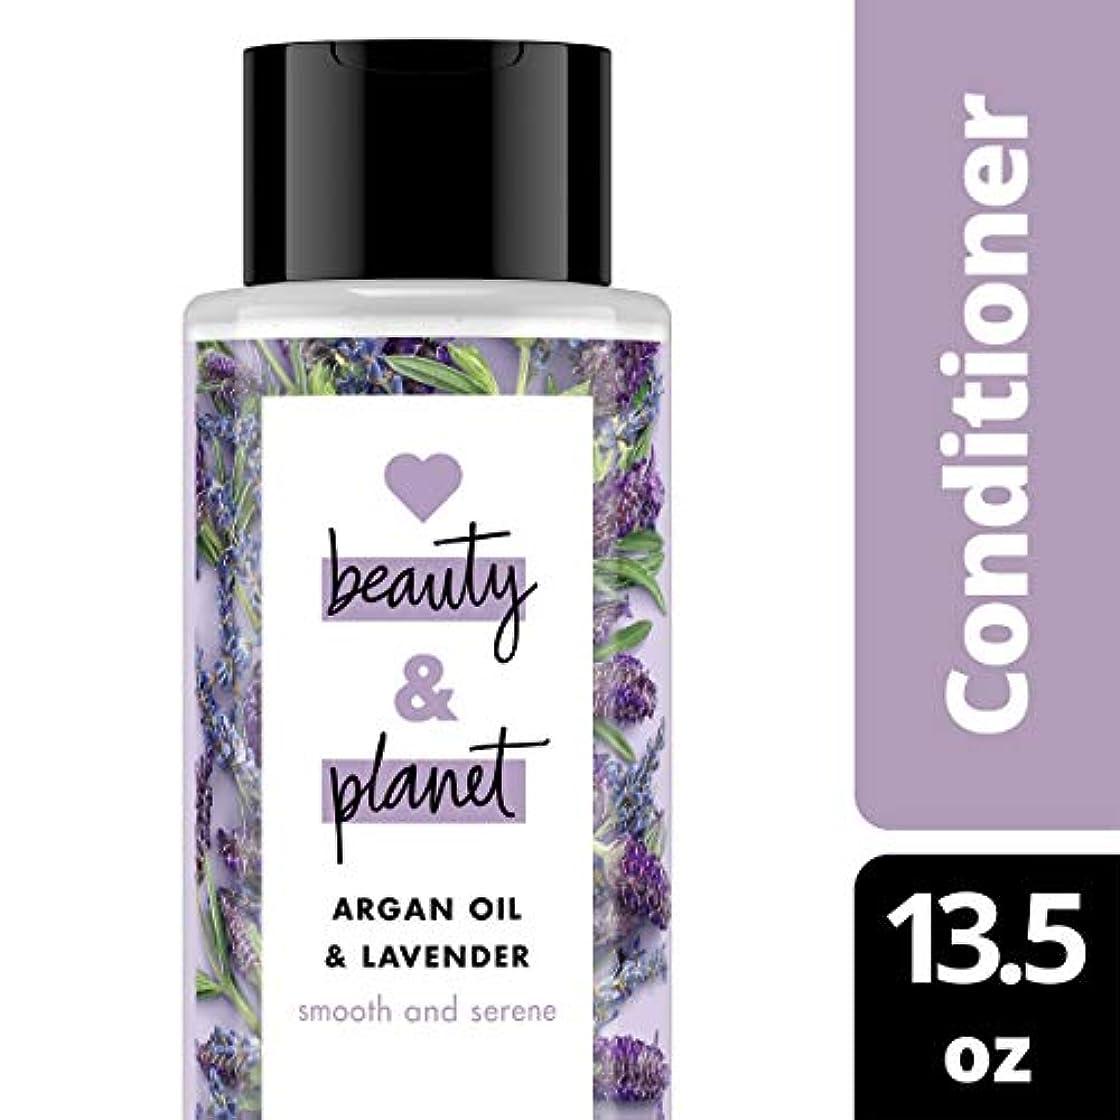 Argan Oil and Lavender Conditioner